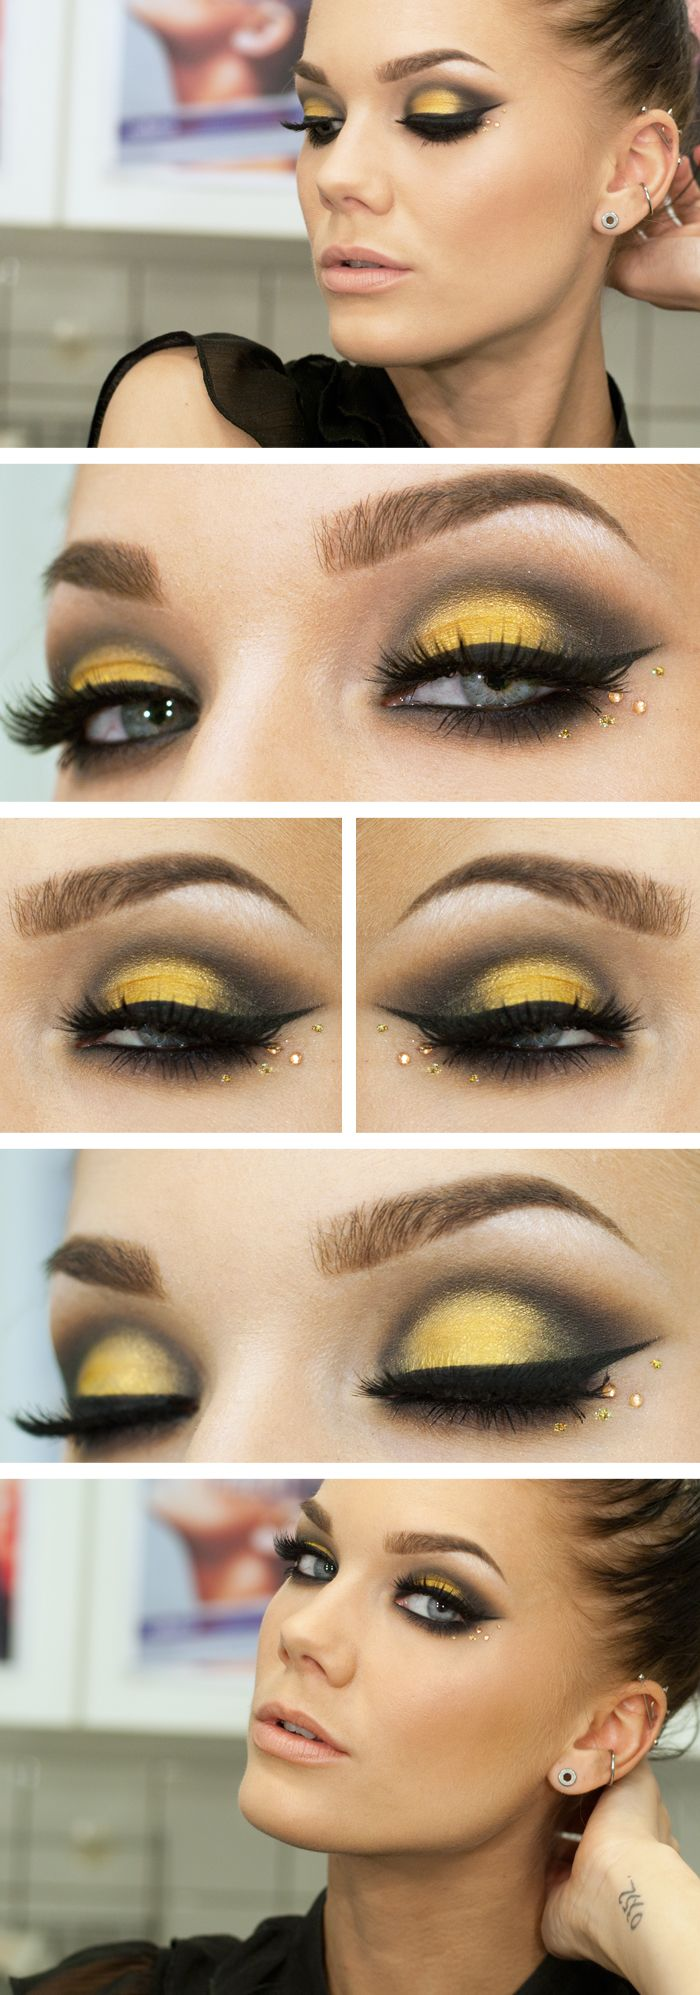 Best 25+ Batgirl makeup ideas on Pinterest | Batman makeup ...